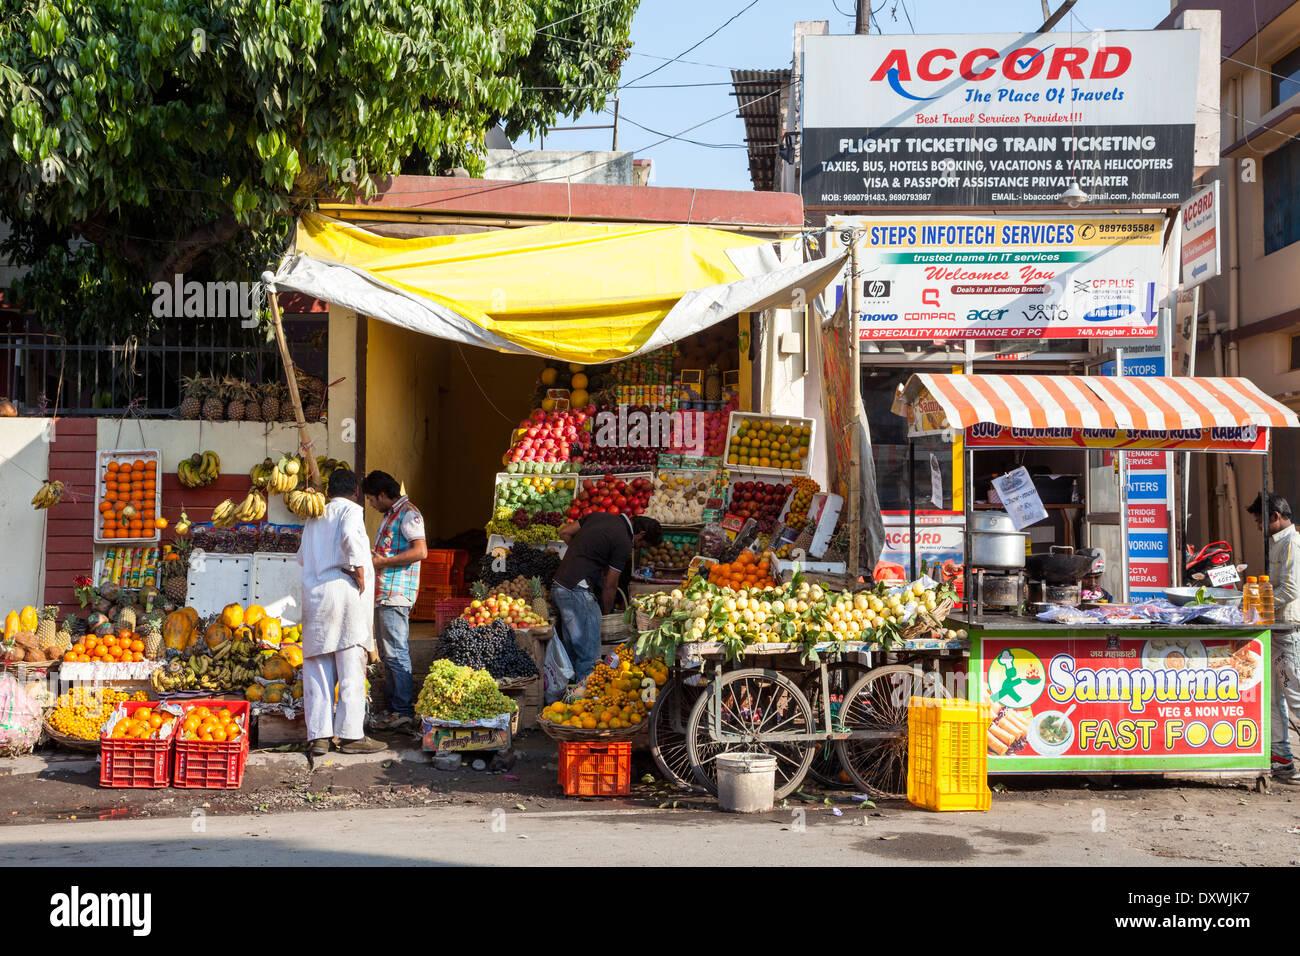 India, Dehradun. Street Scene--Fast Food, Fruit Stand, Travel Agency. - Stock Image